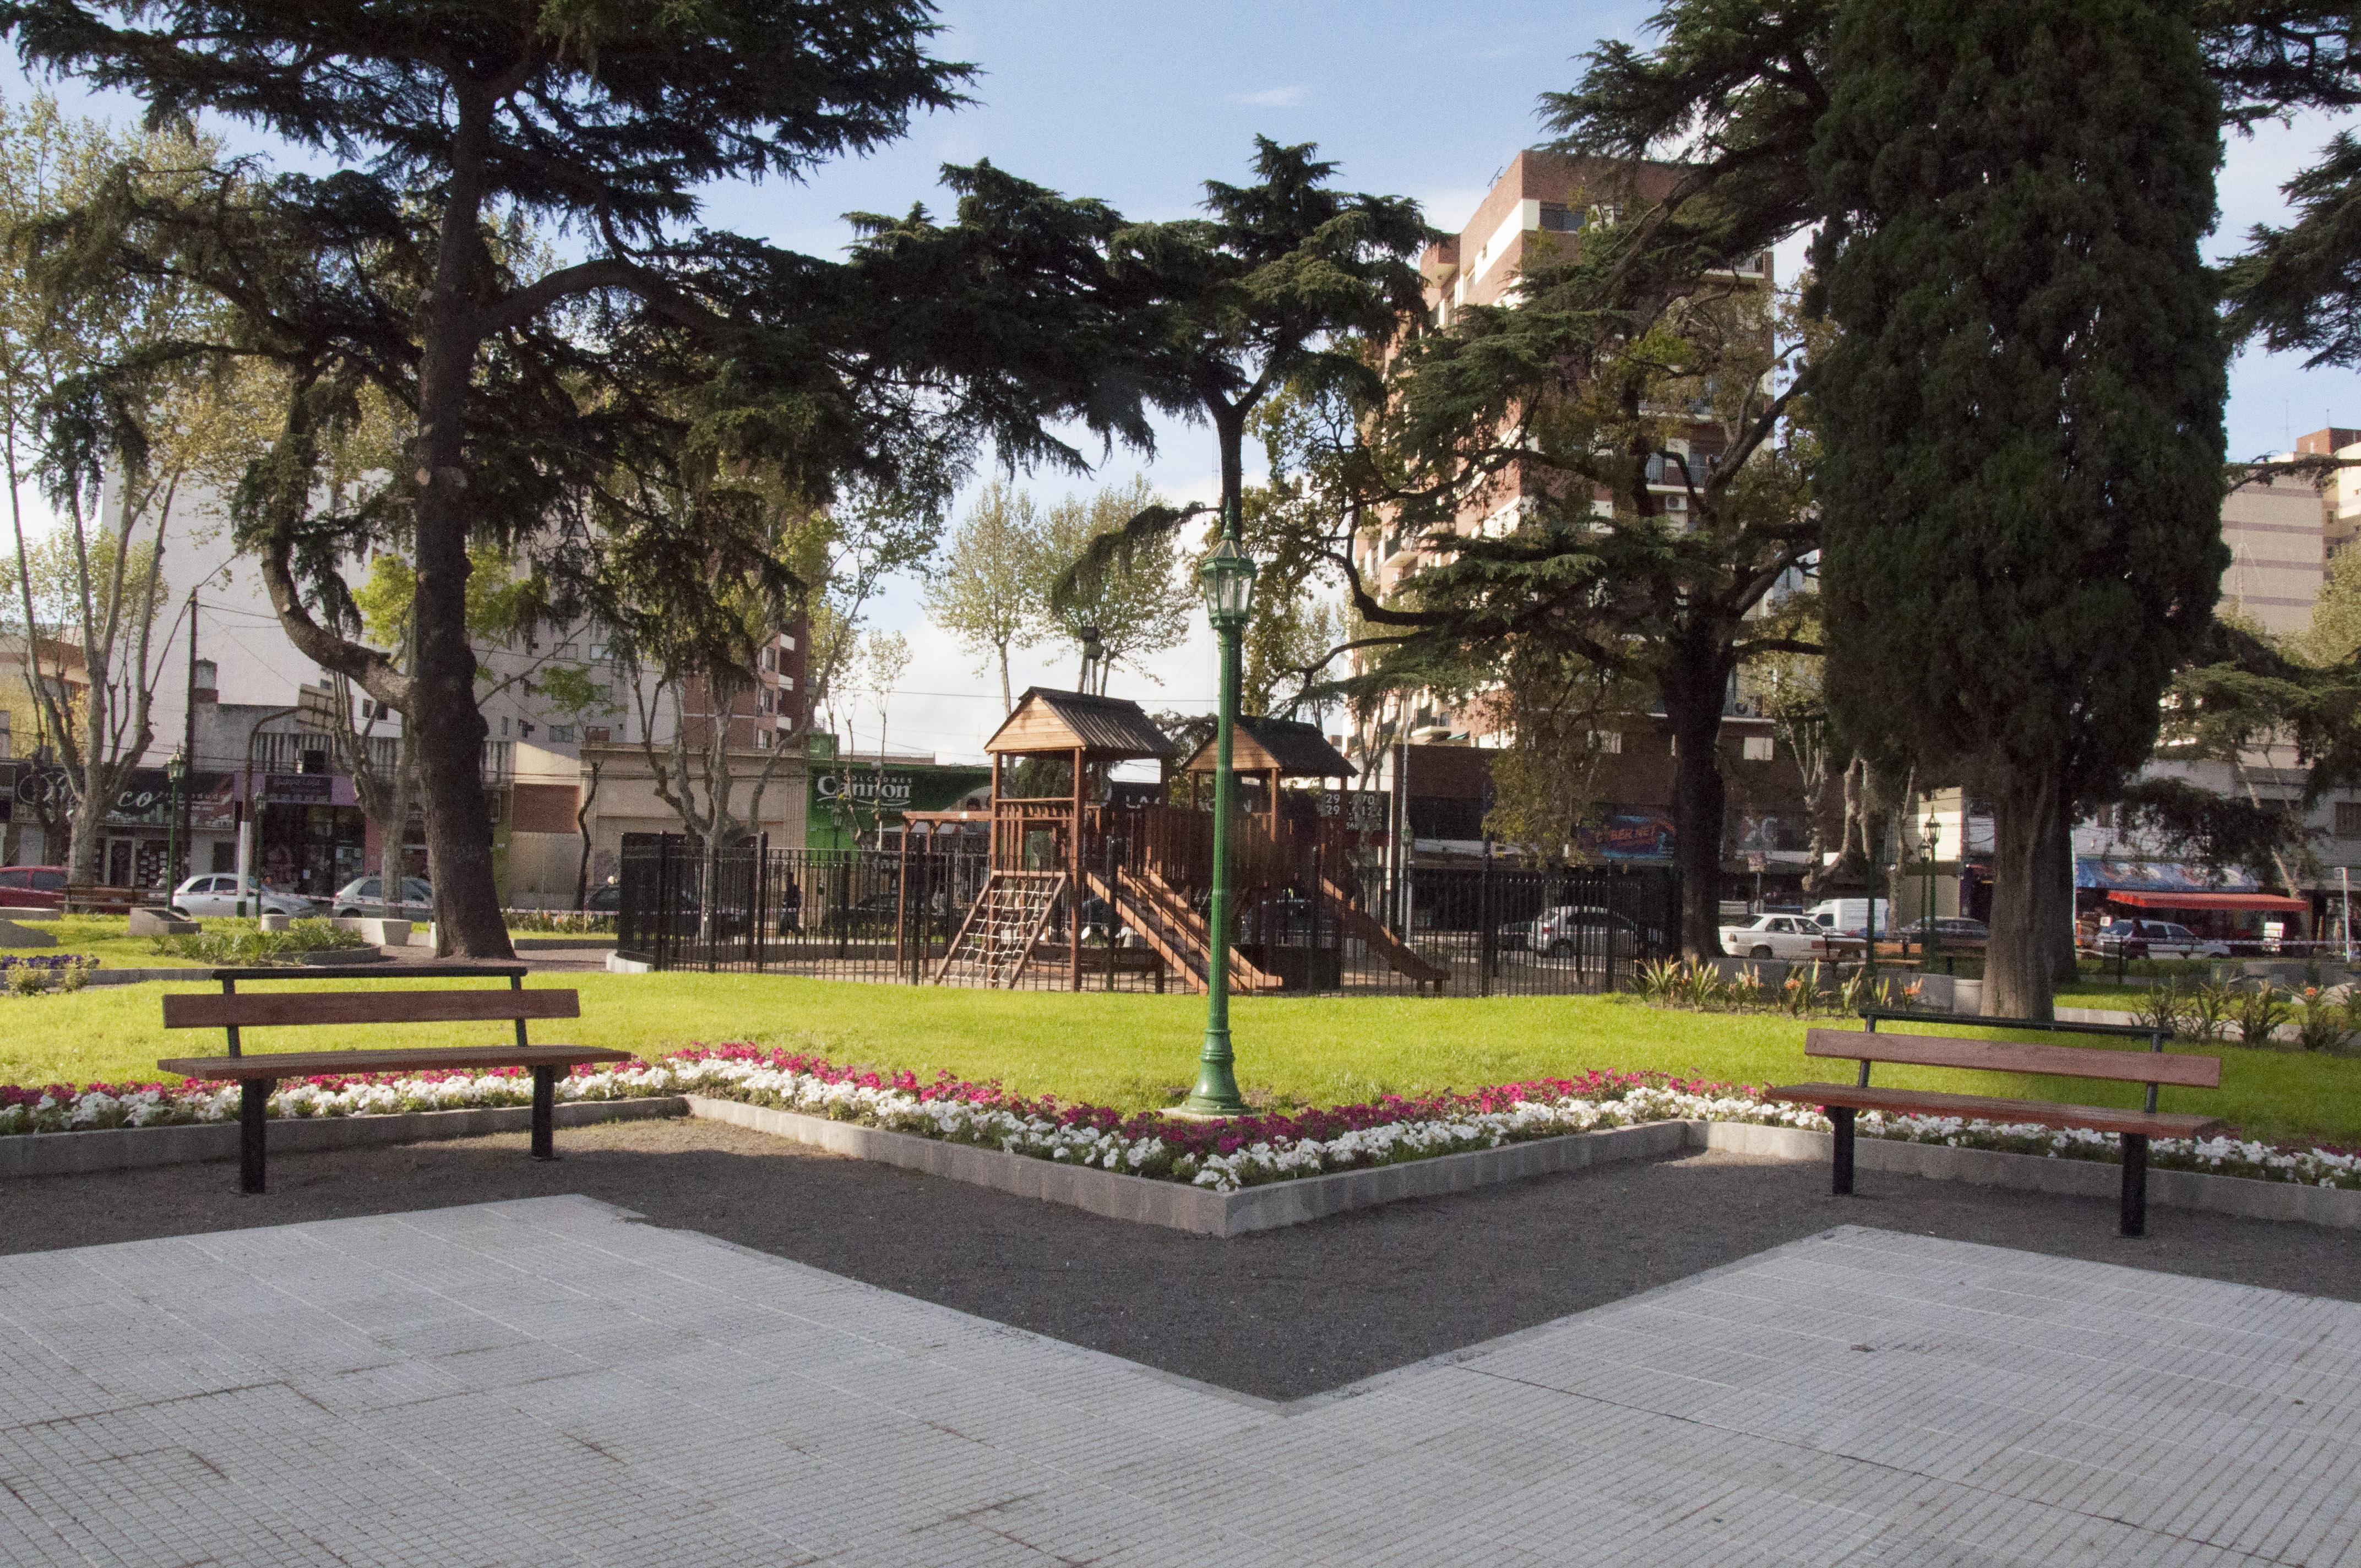 La plaza Santamarina recobró su viejo esplendor